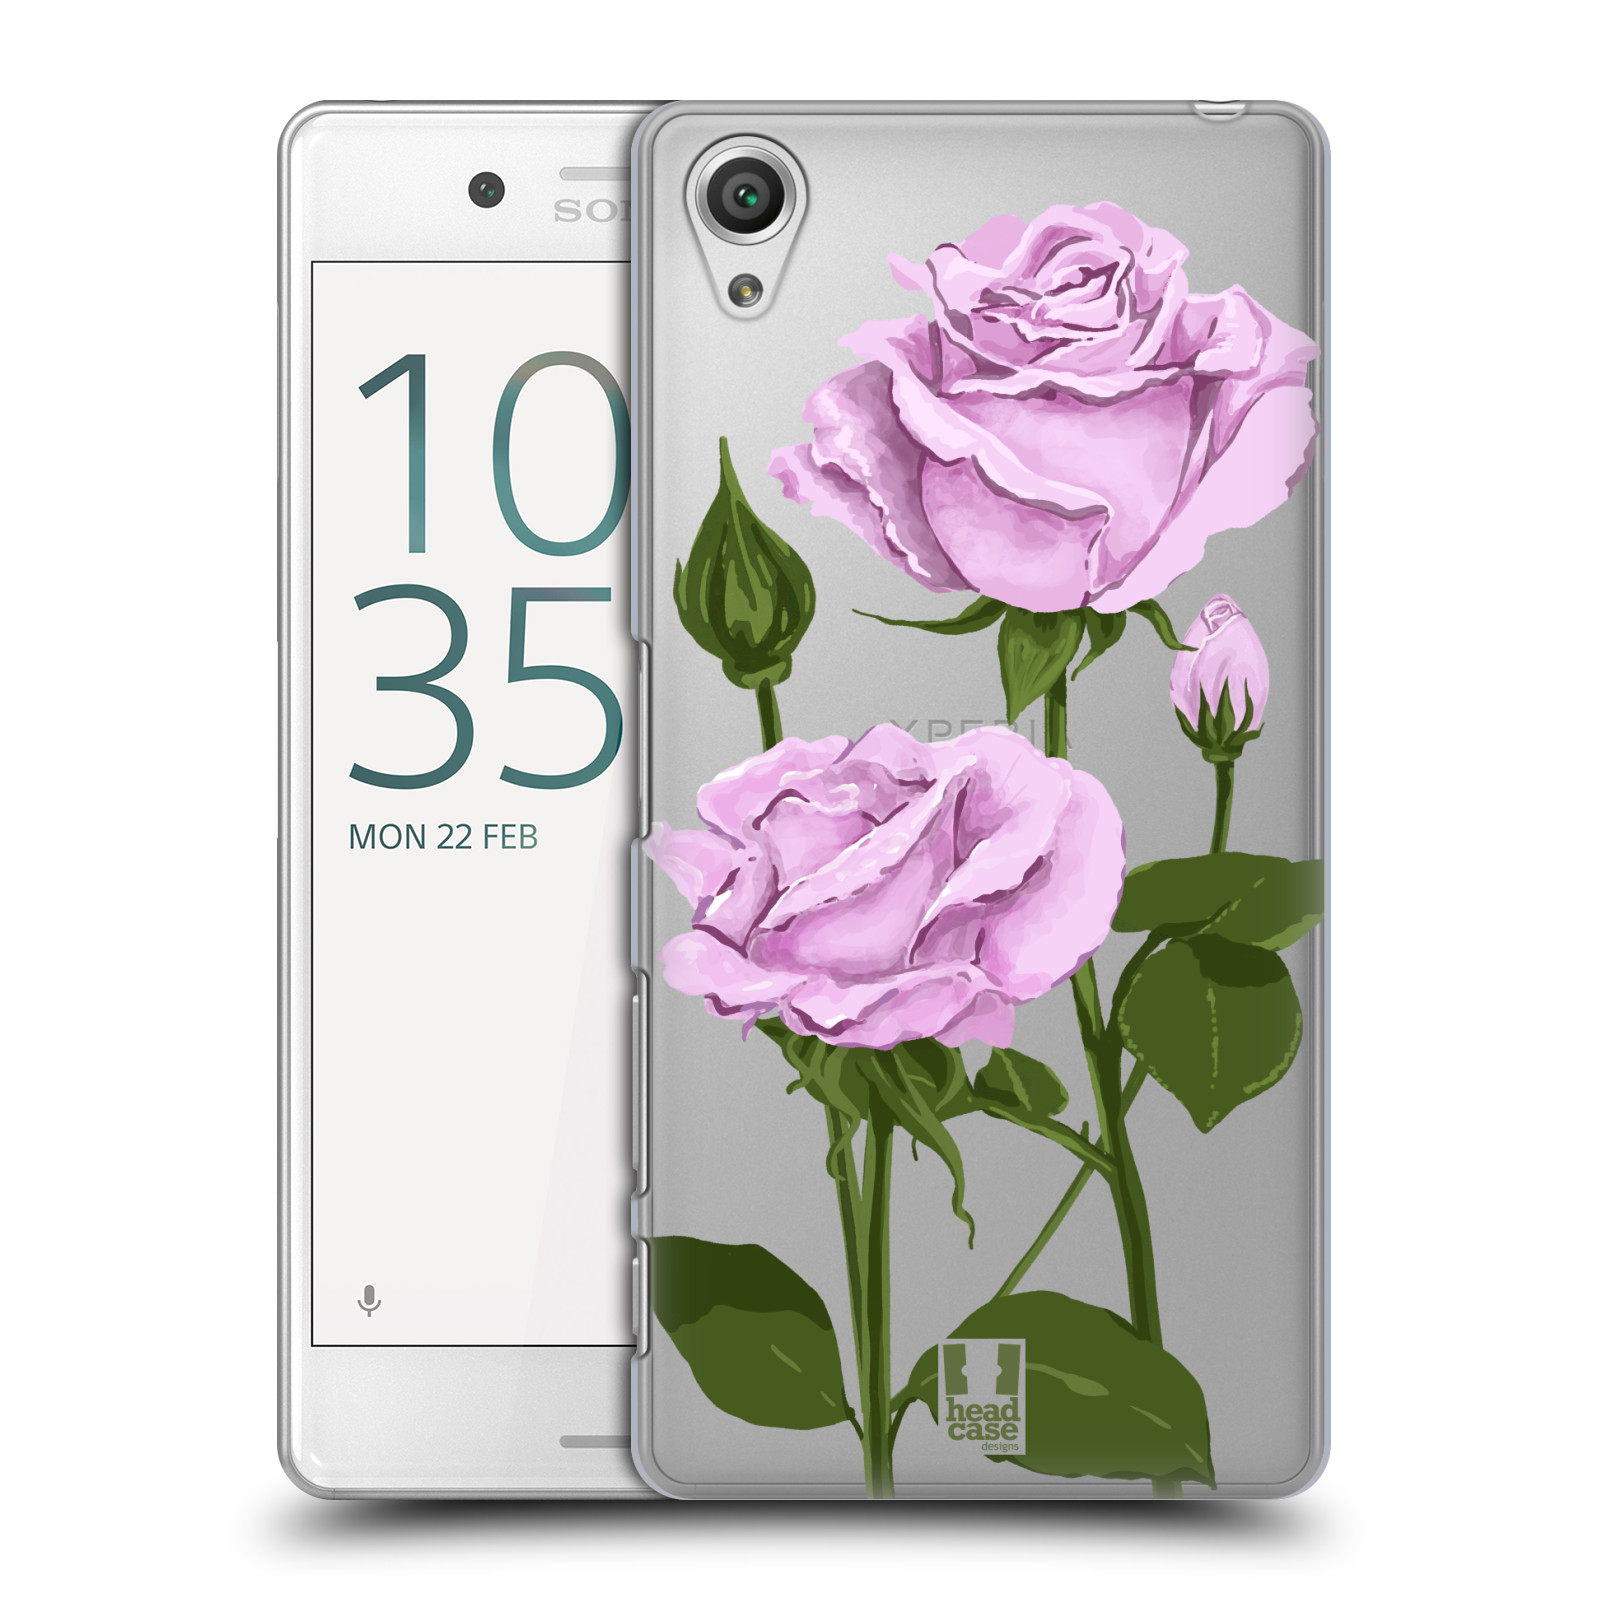 Pouzdro na mobil Sony Xperia X PERFORMANCE - HEAD CASE - květina růže růžová